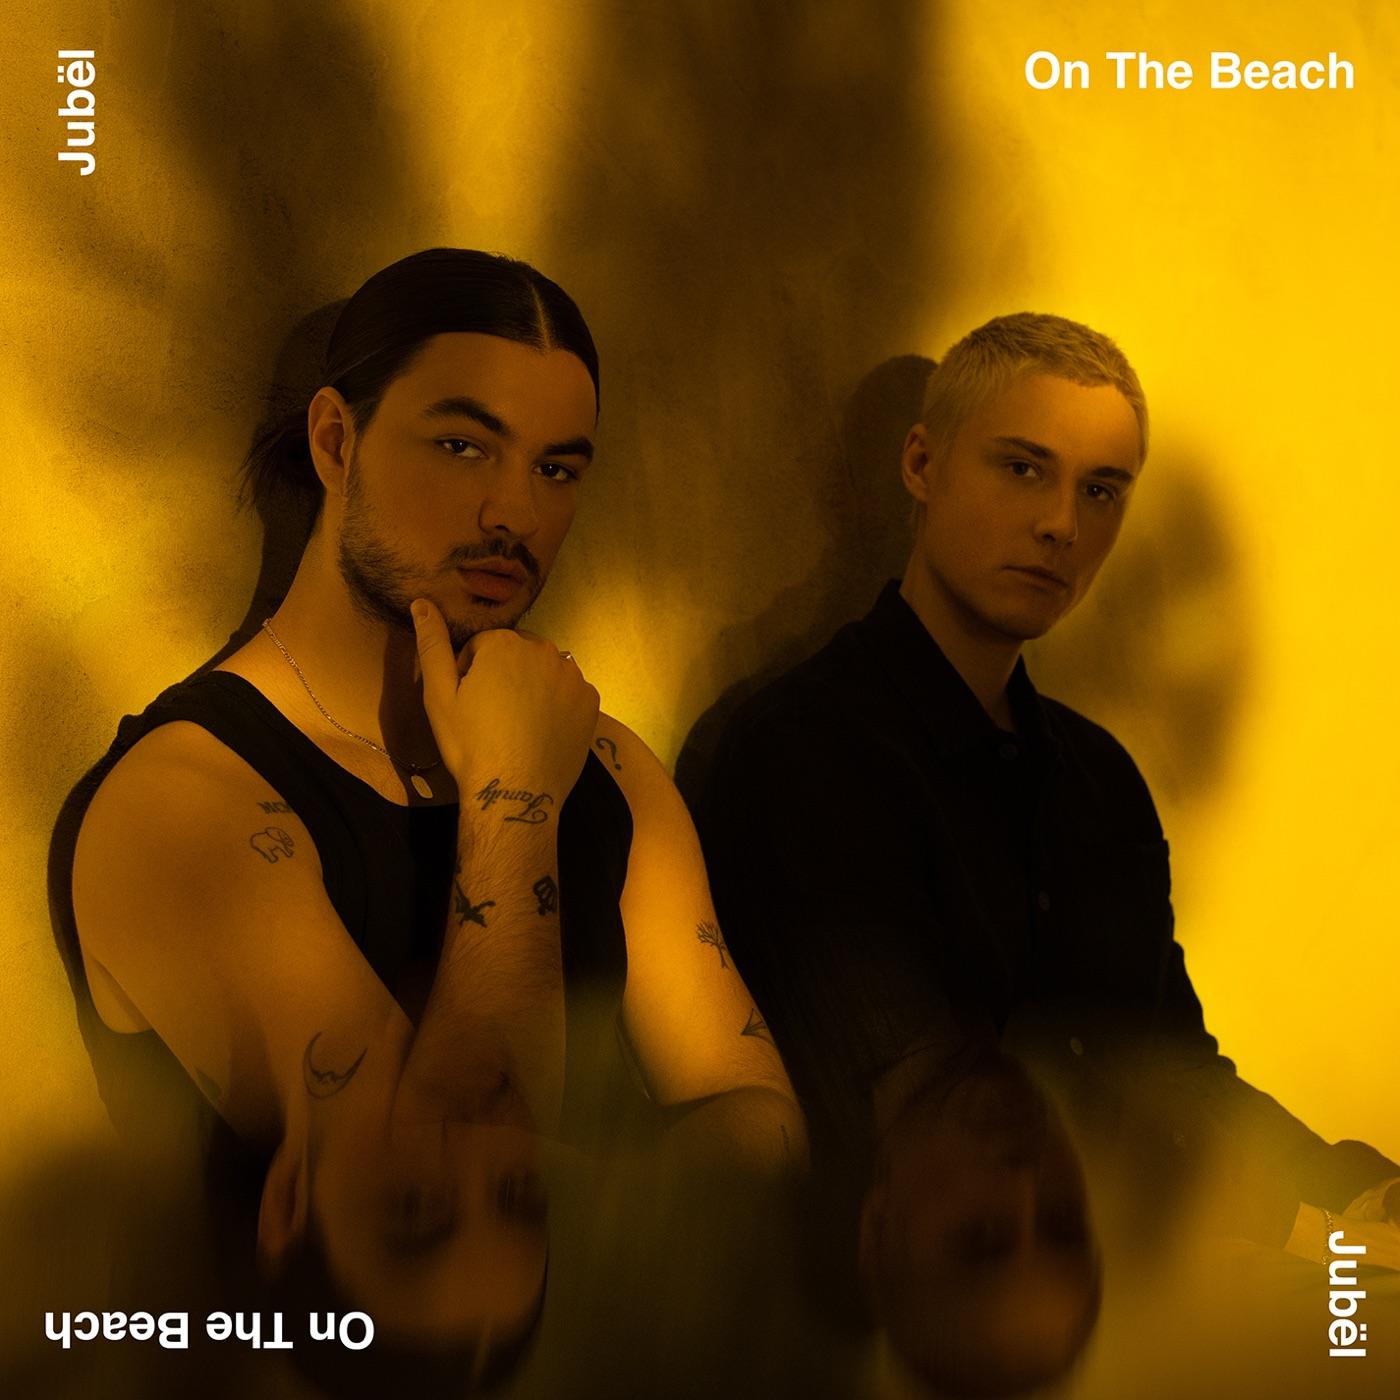 Jubel - On The Beach